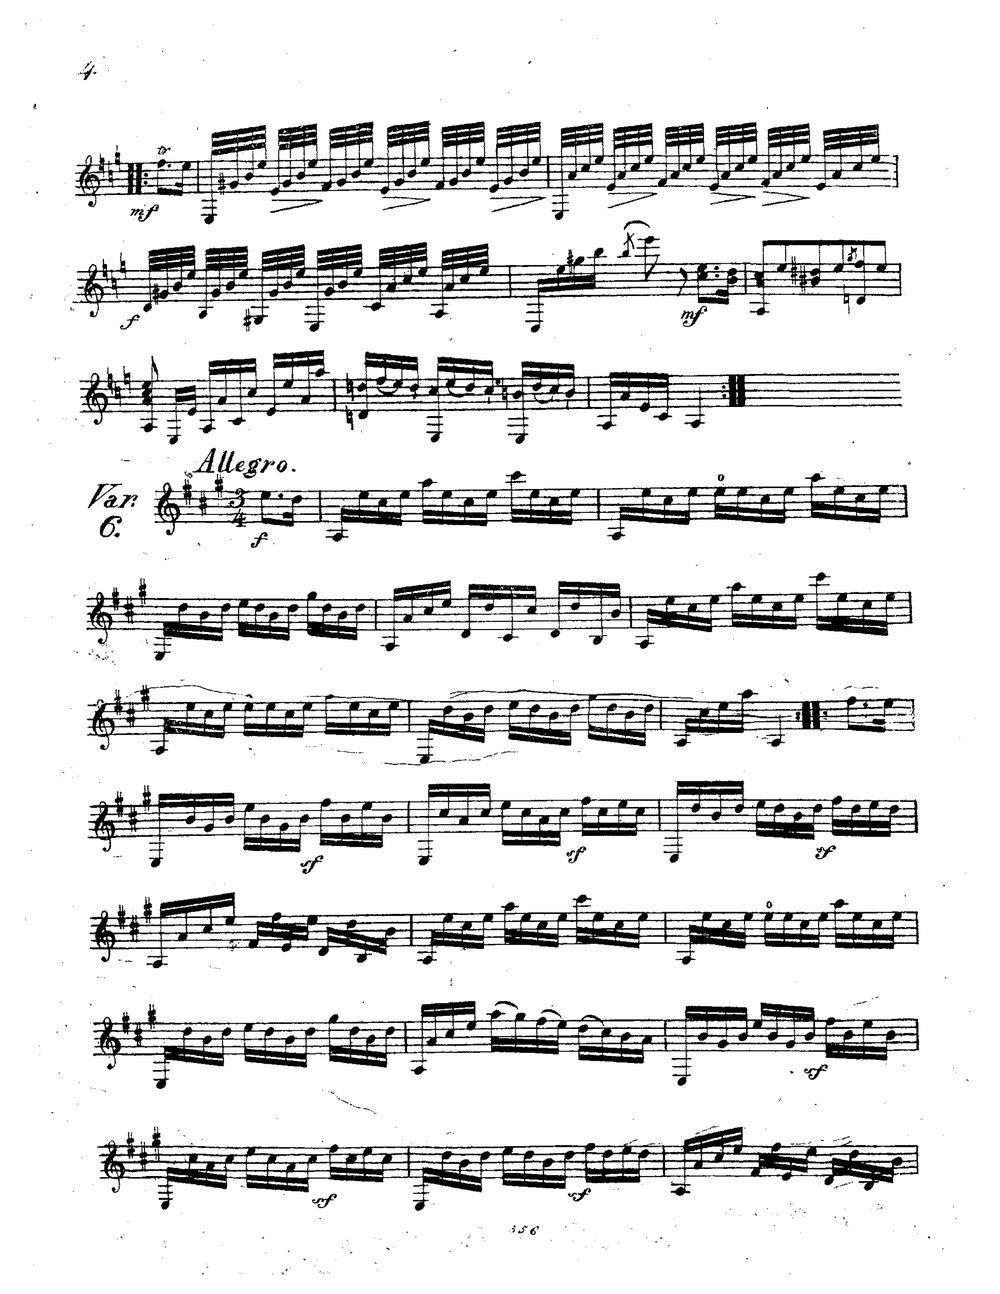 Easy Variations on 'Wer hört wohl jemals mich klagen?', Op.10 (Calegari, Francesco) 4.jpg